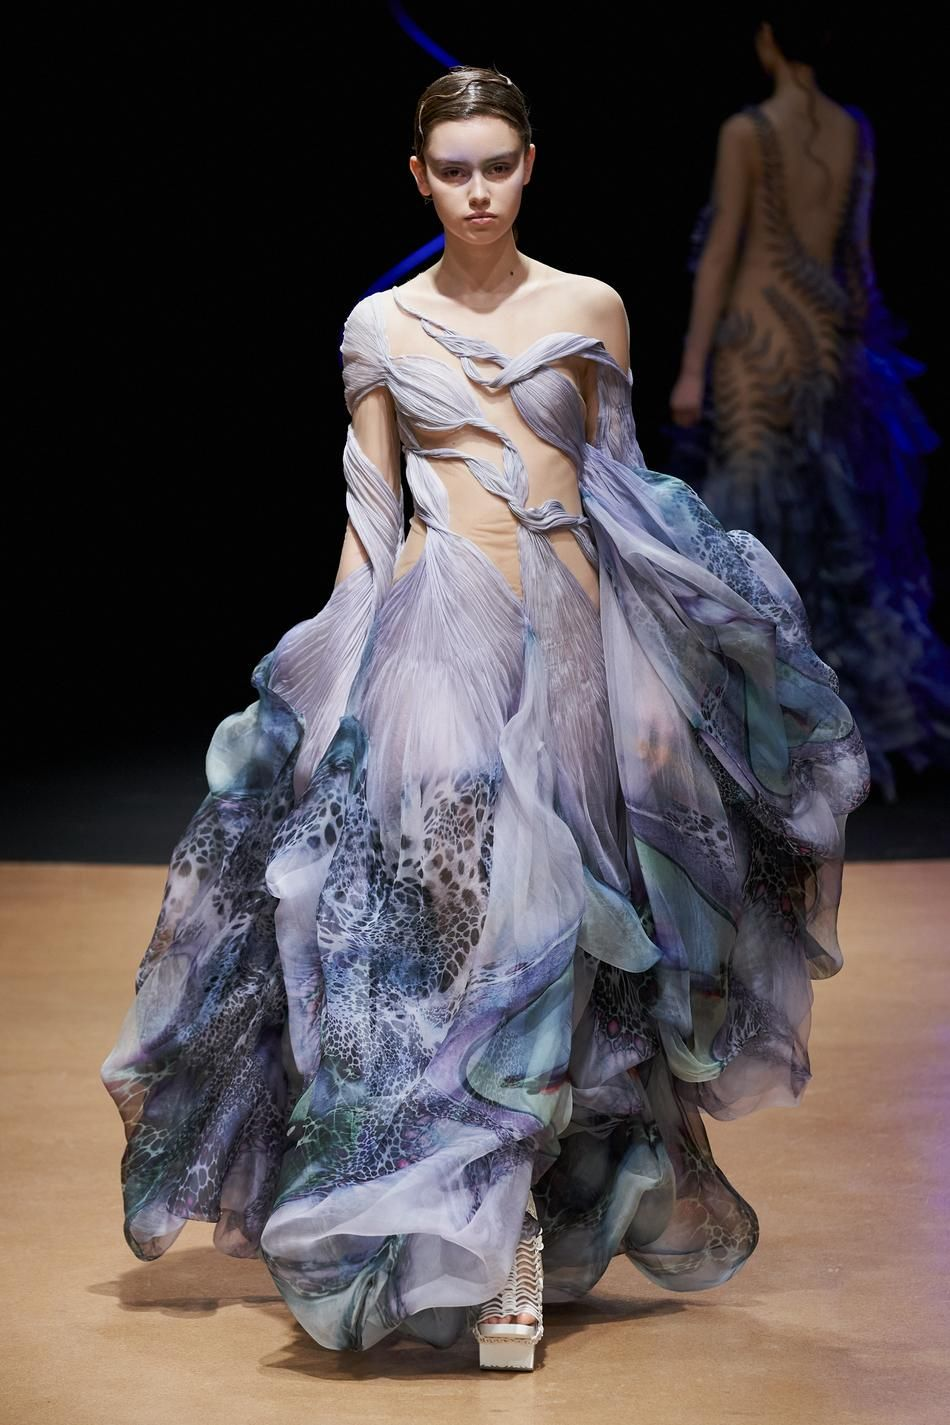 Photo of Défilé Iris van Herpen printemps-été 2020 Couture